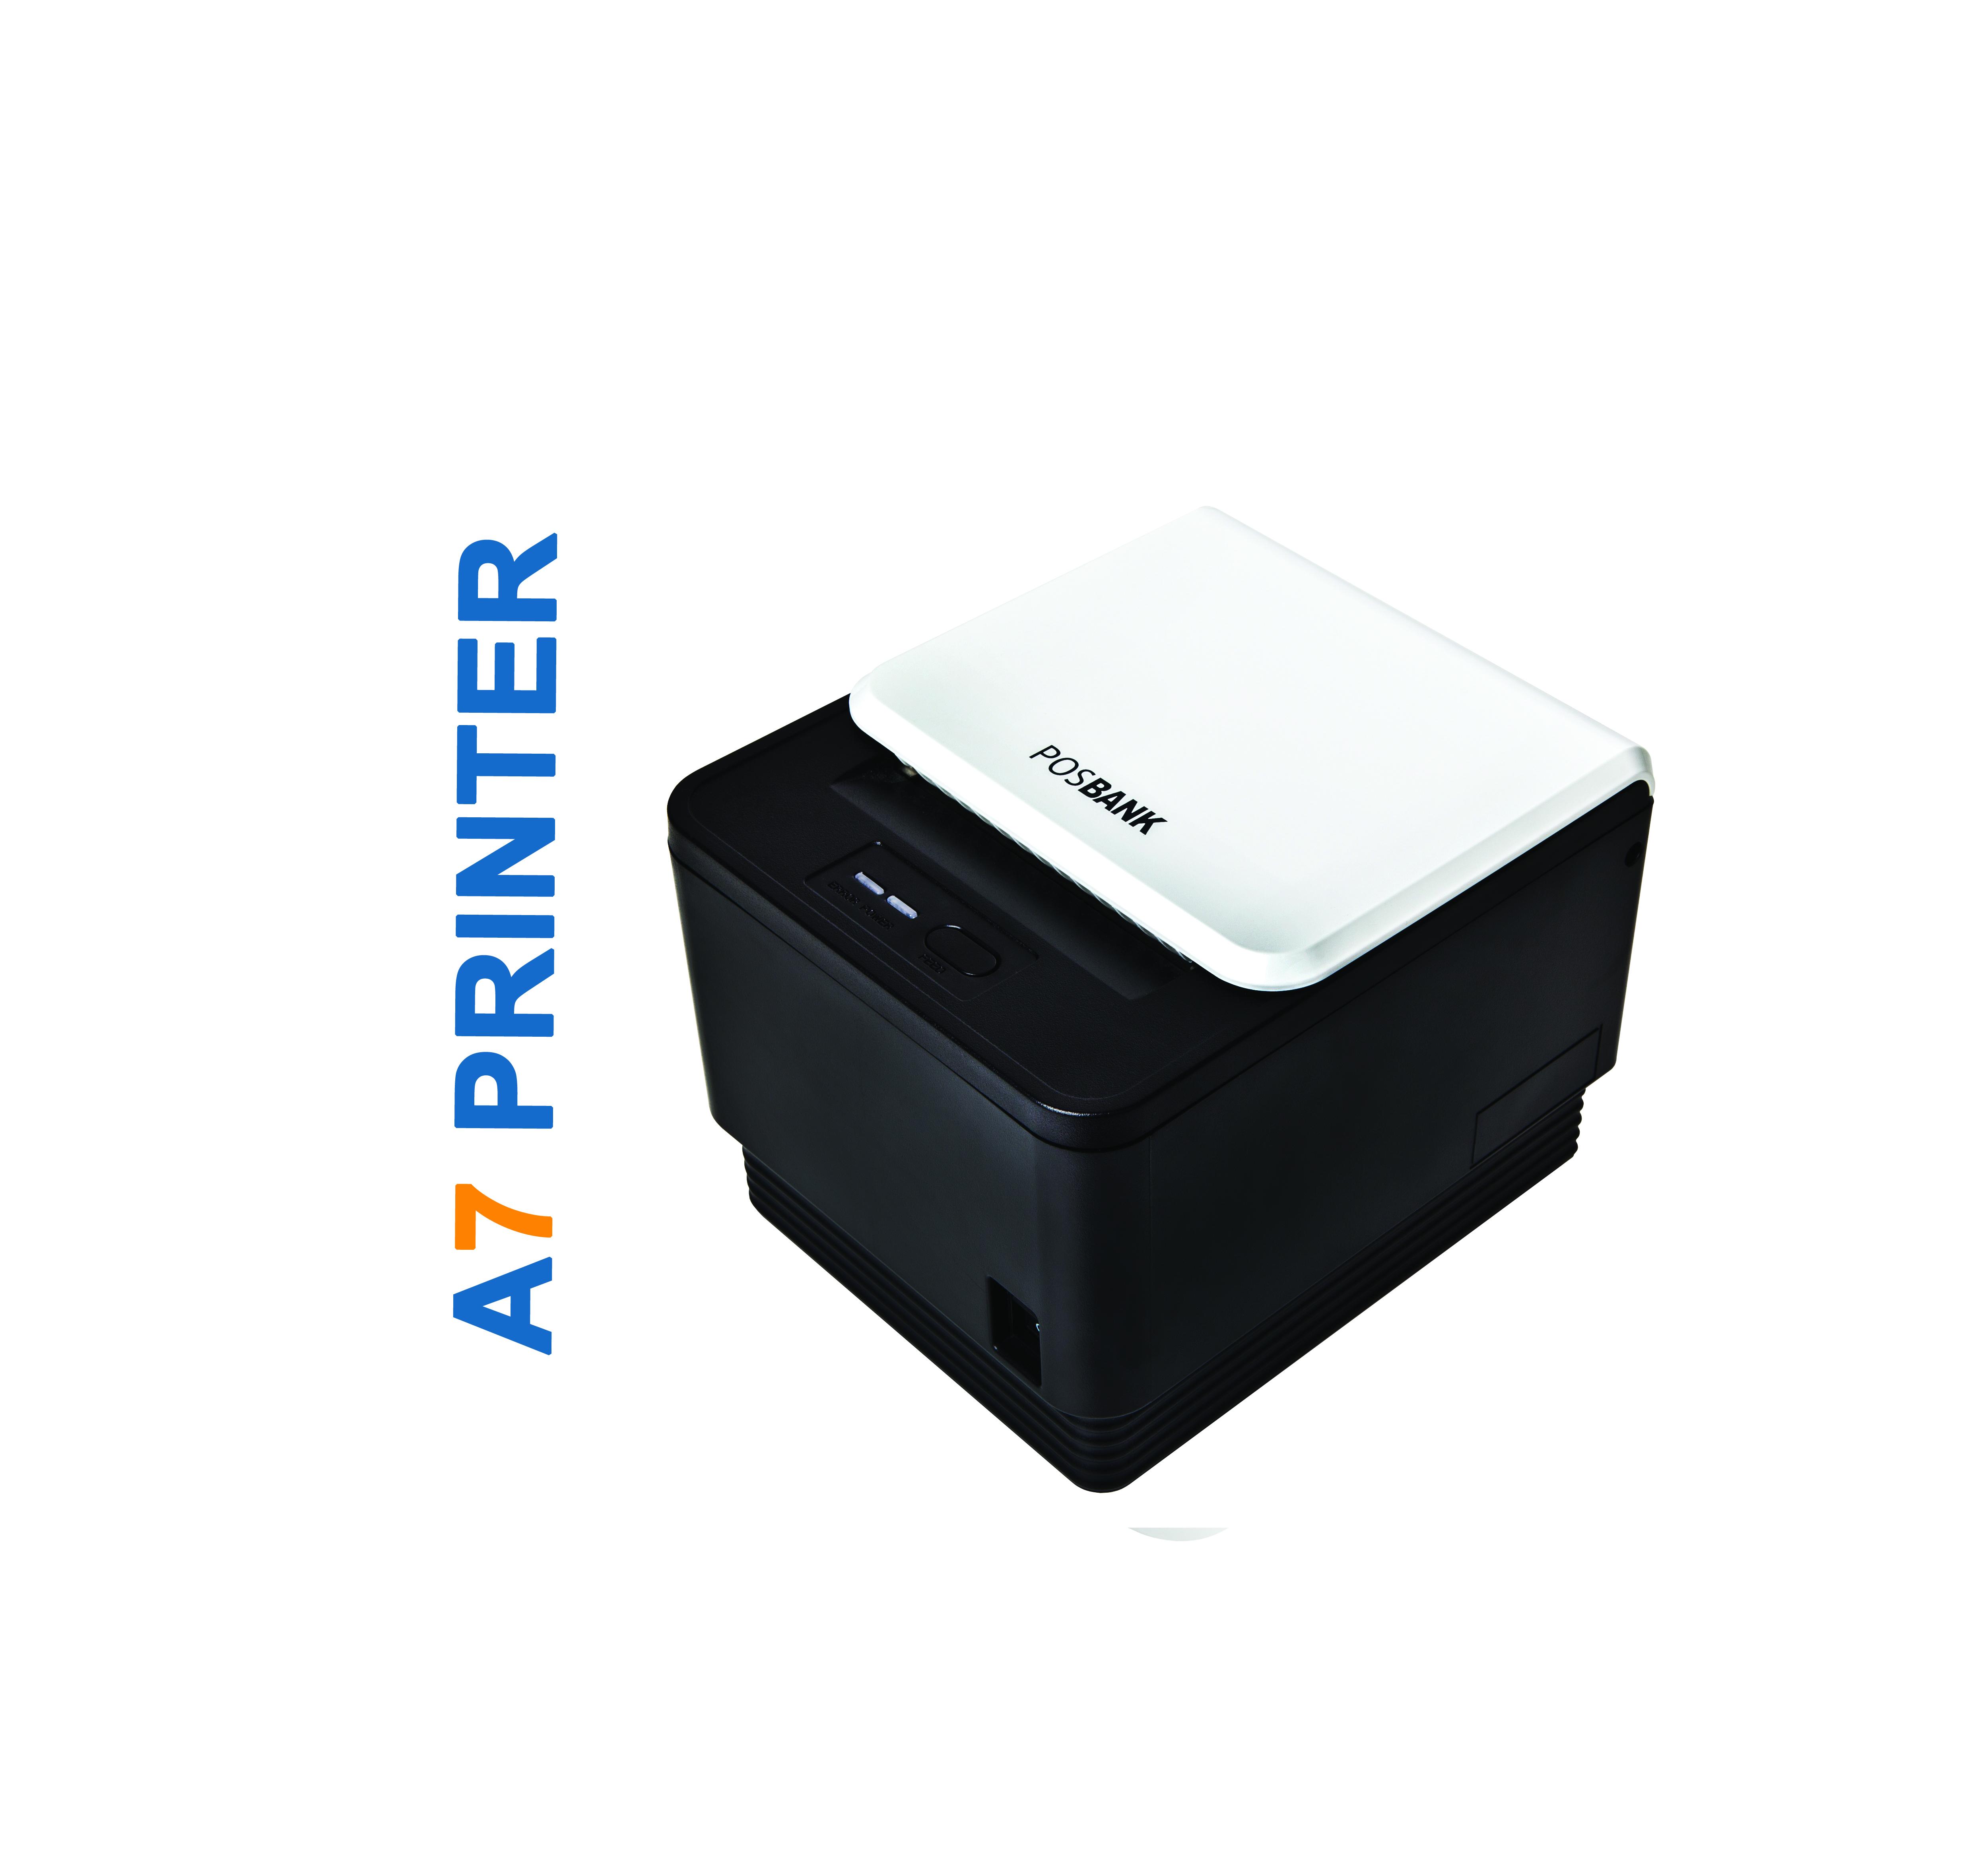 a7 printer.jpg